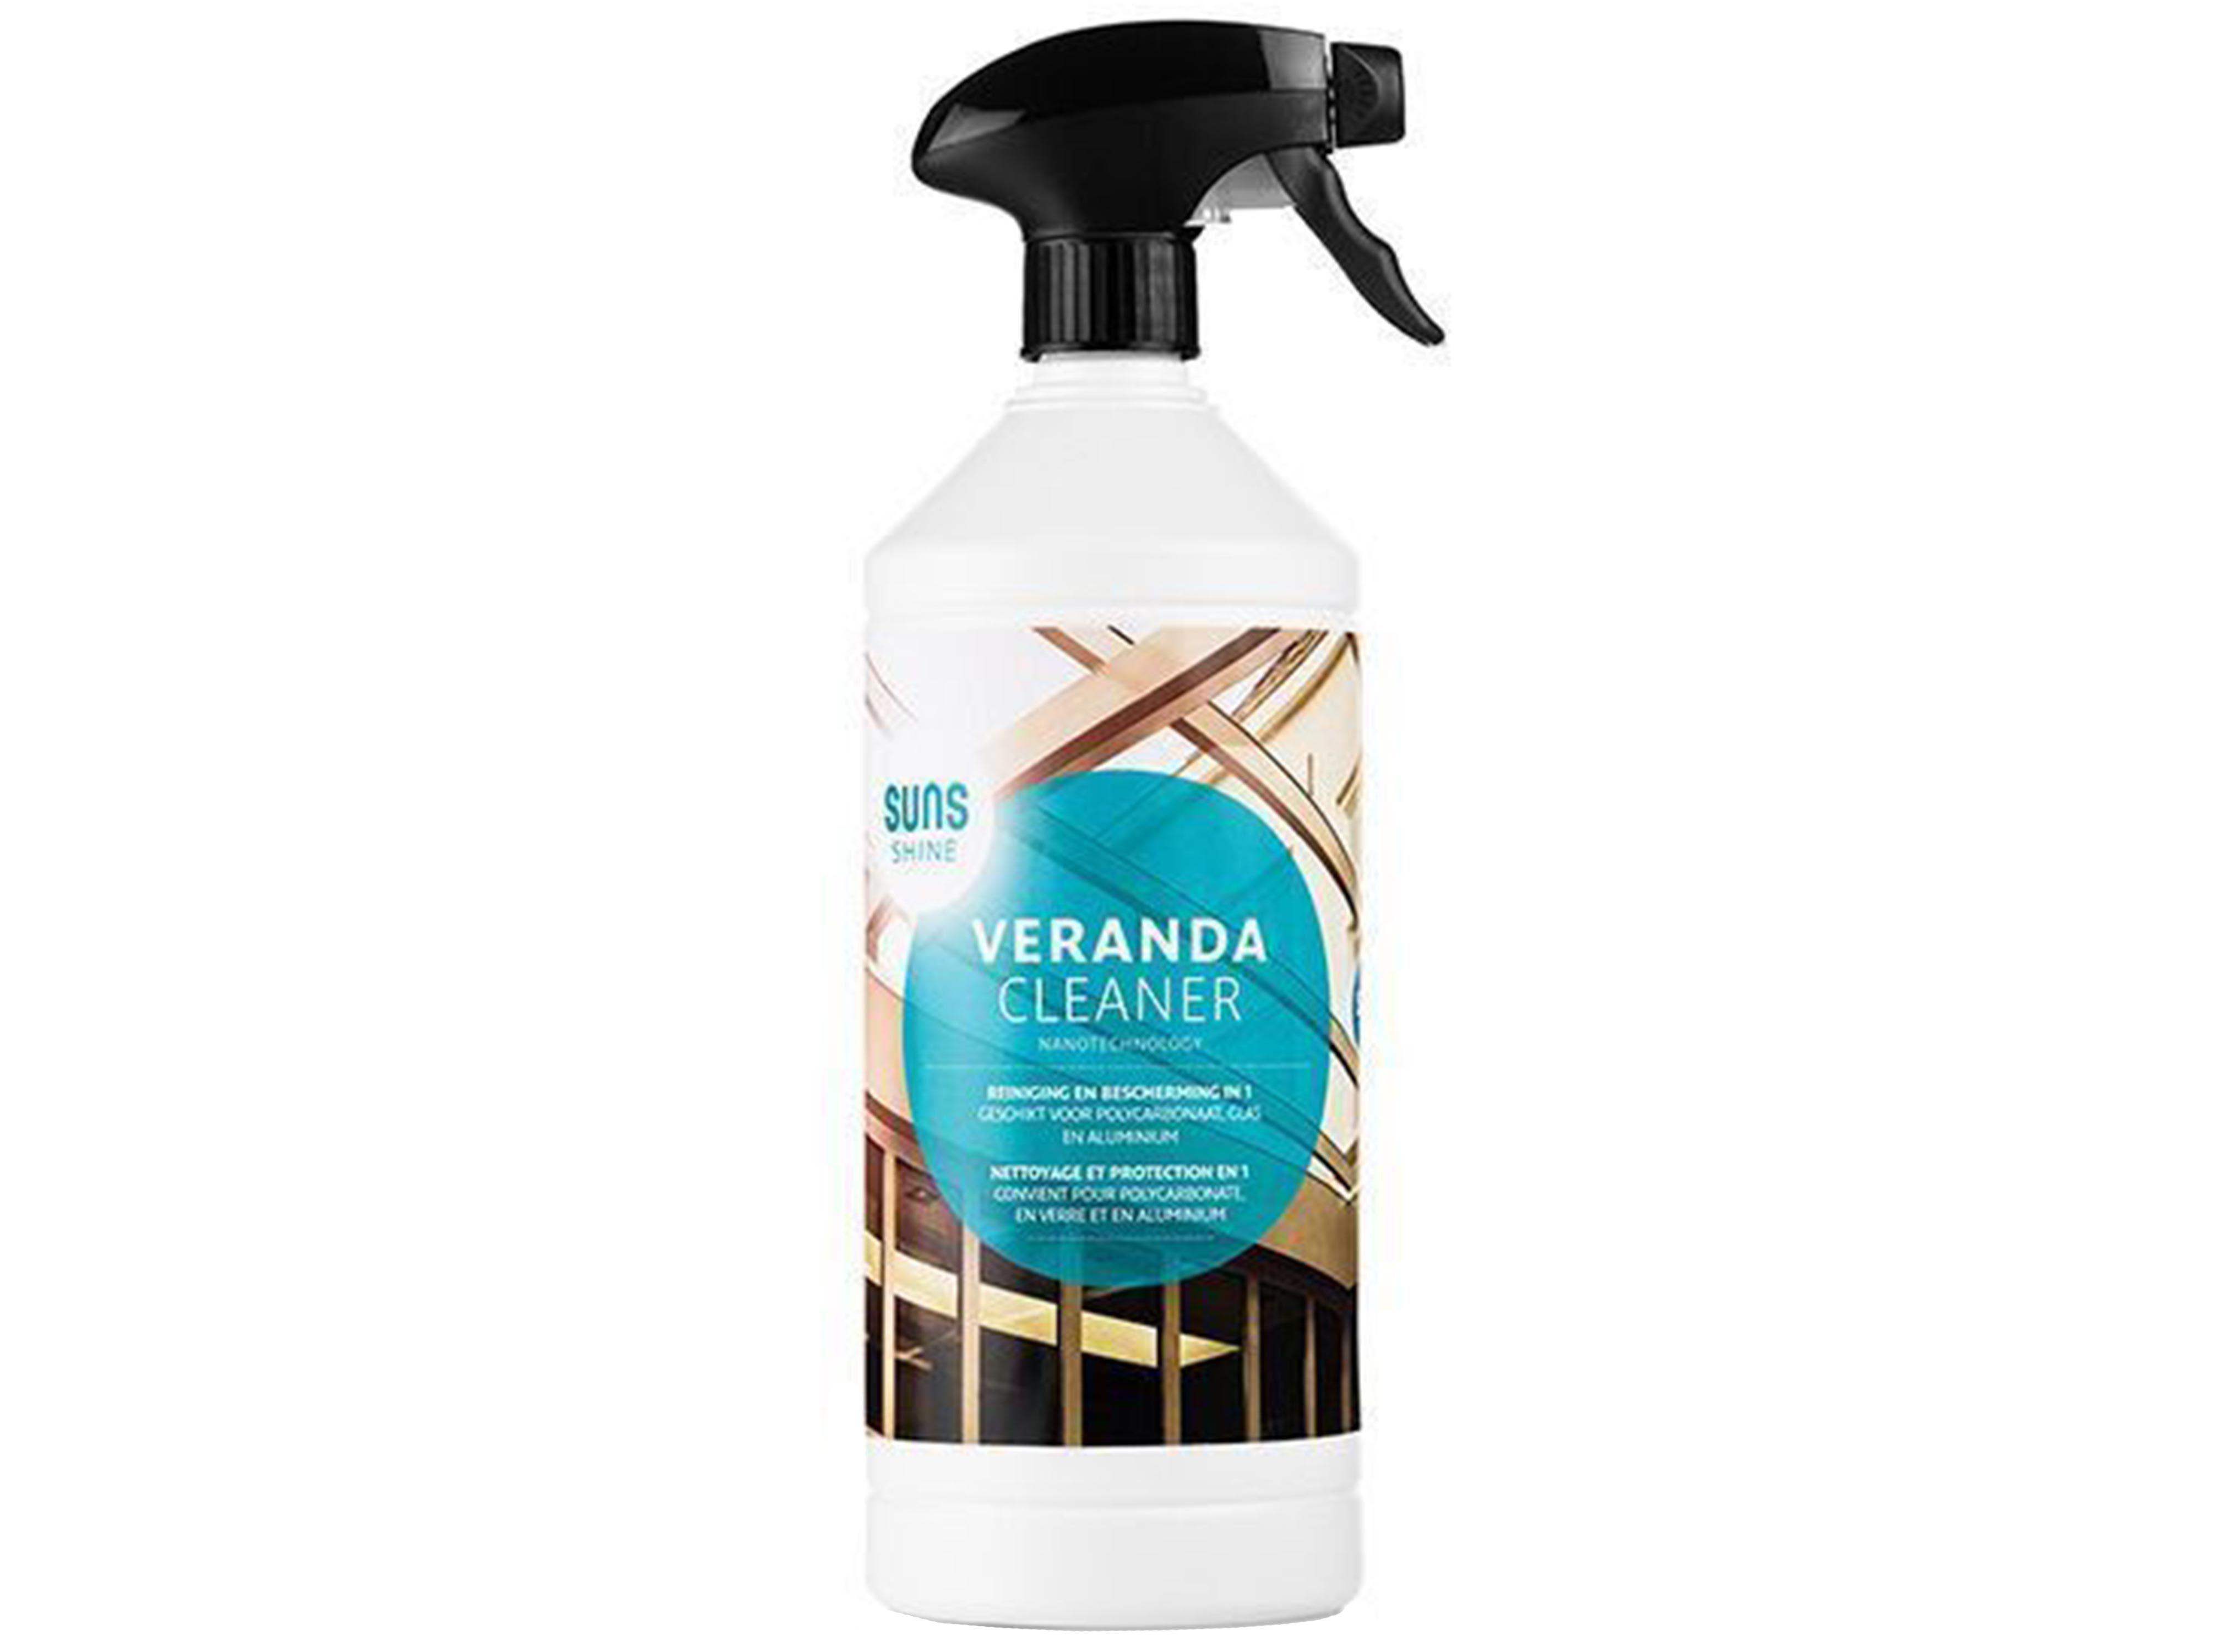 SUNS | Veranda/Patio Cleaner | 1 liter